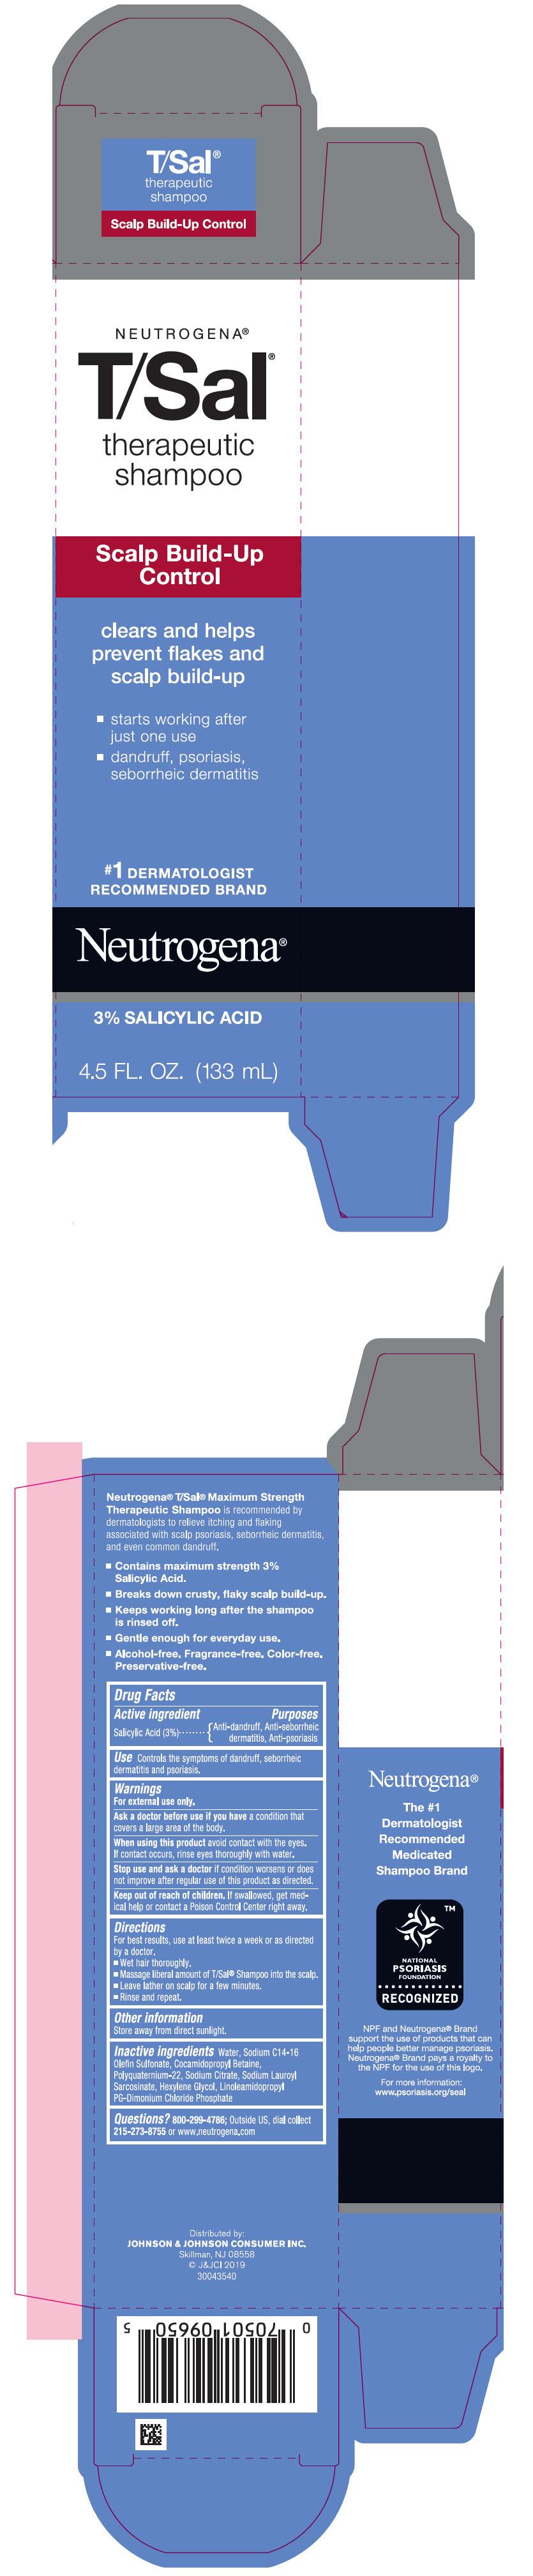 PRINCIPAL DISPLAY PANEL - 133 mL Bottle Carton